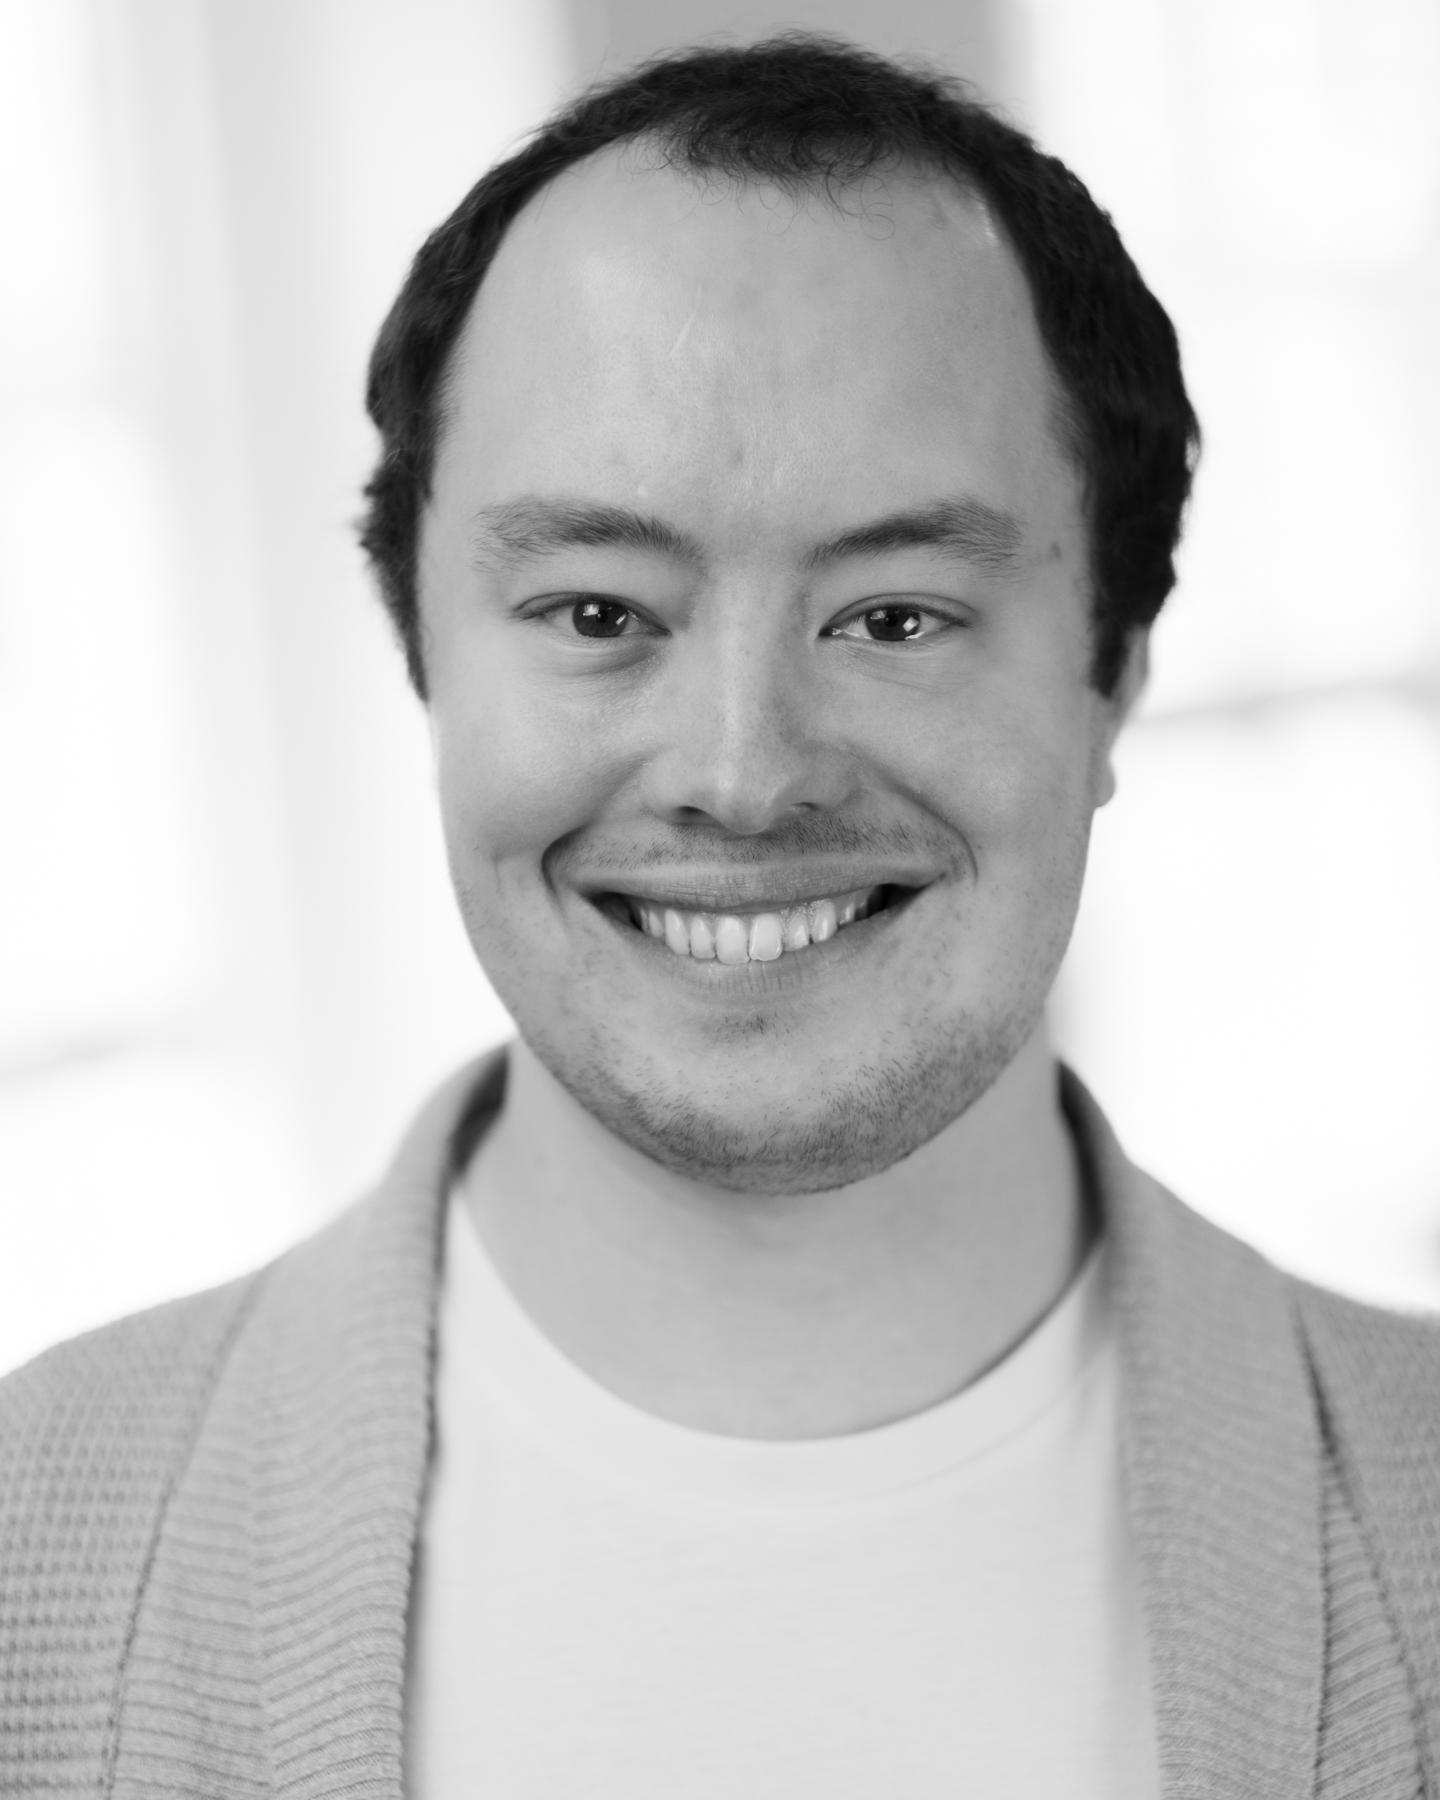 Sam Couzens, Creative Assistant at Shift Momentum